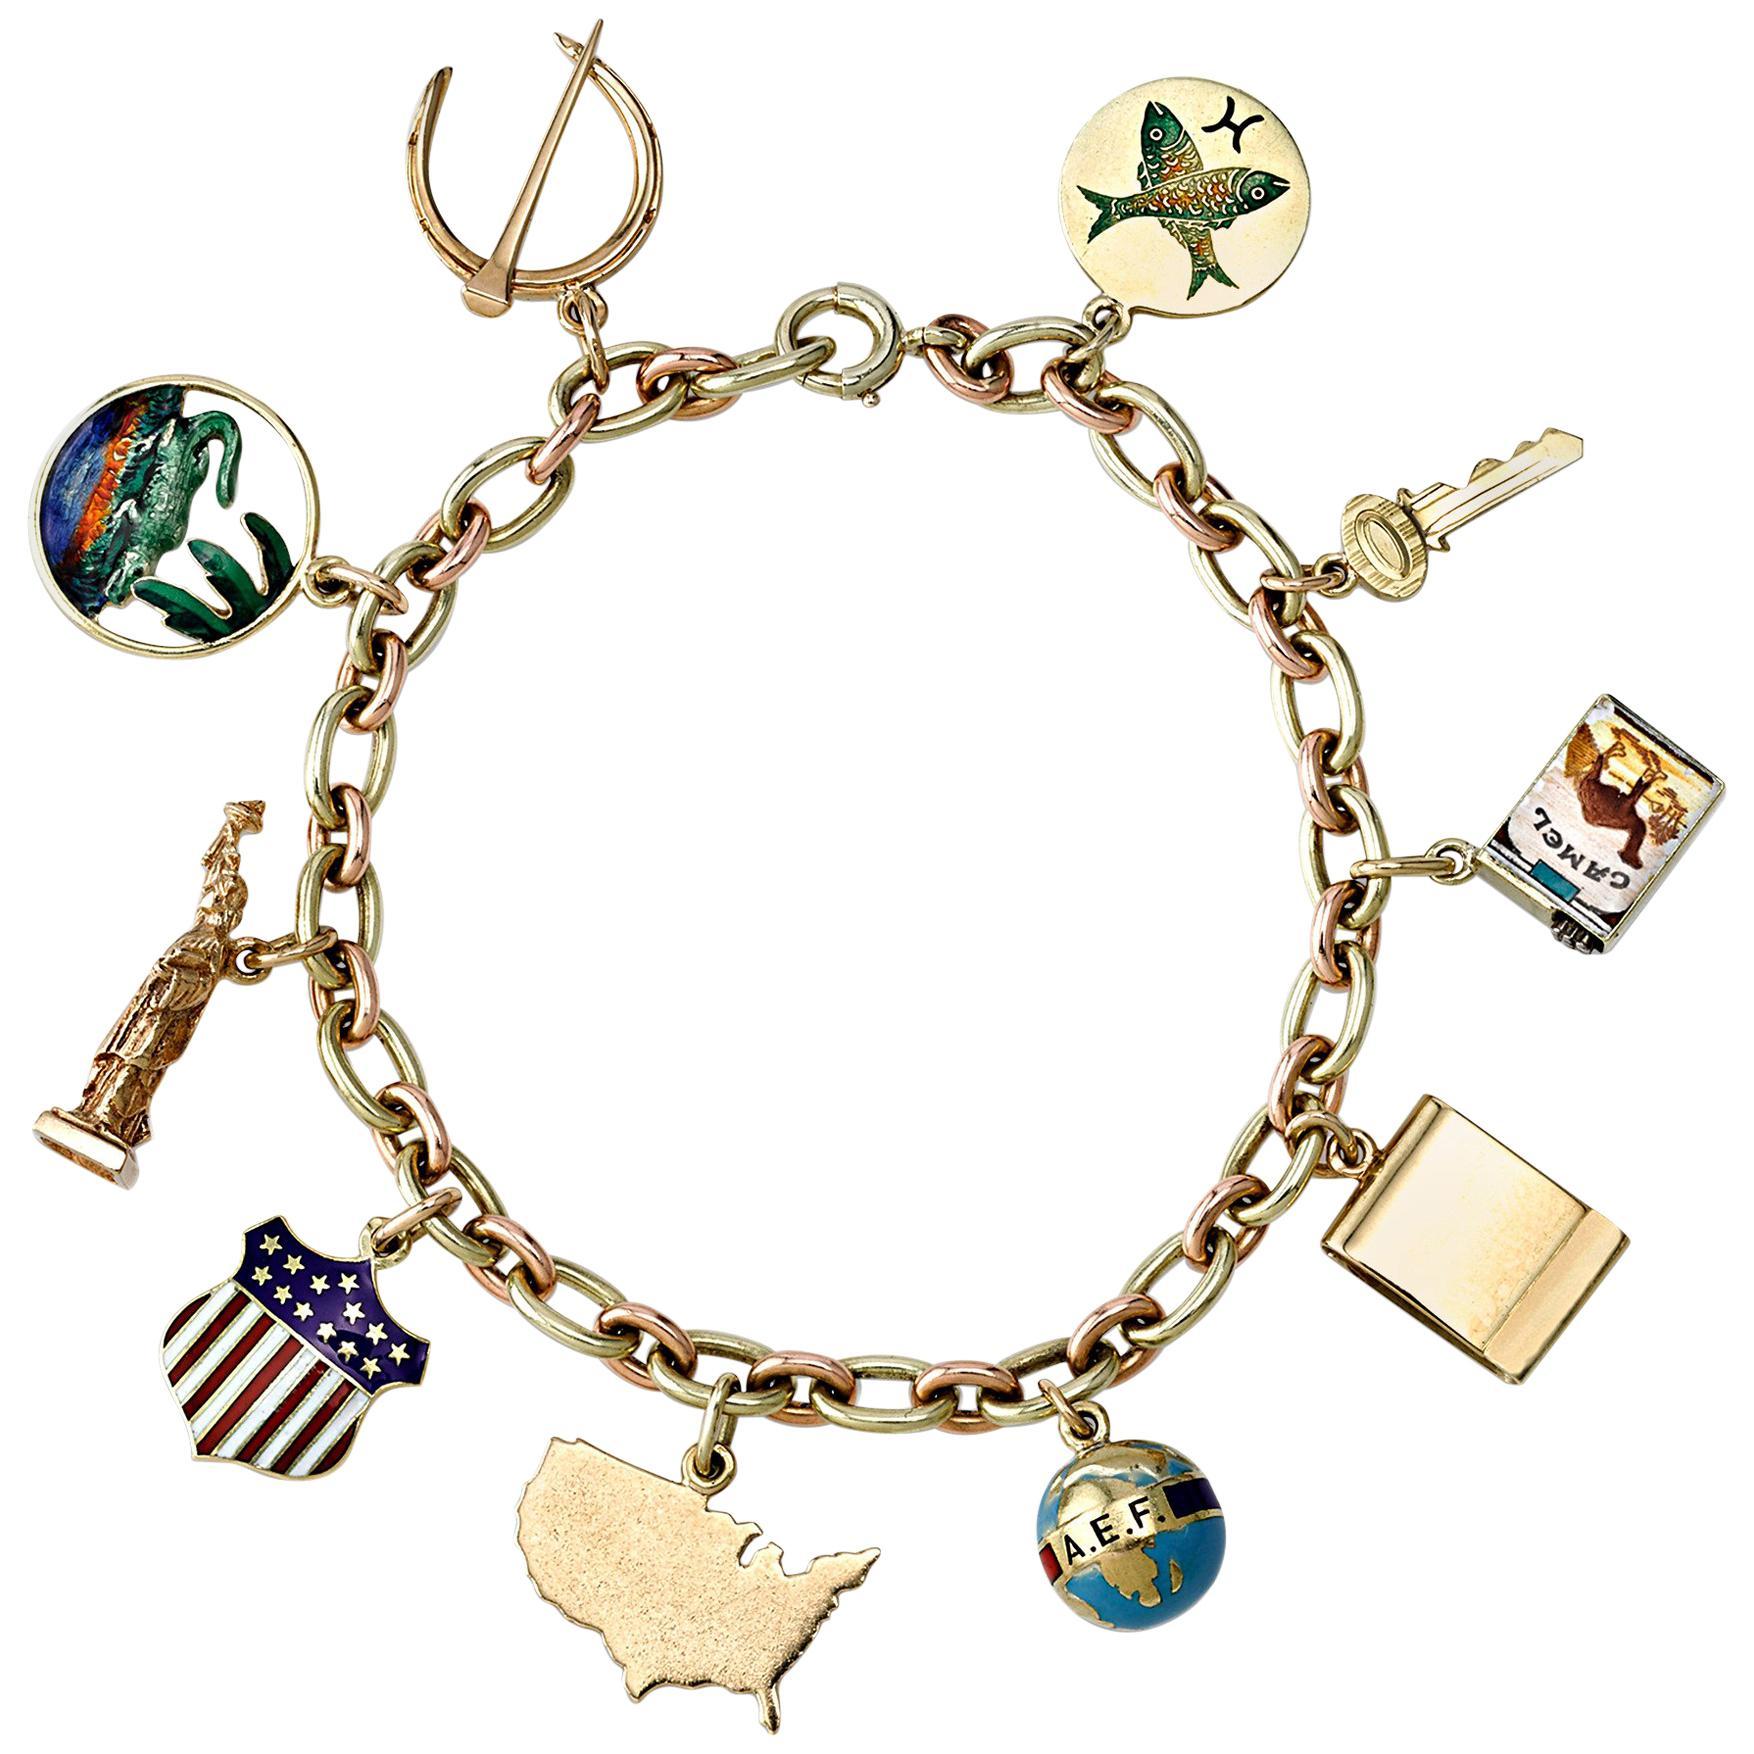 Cartier Gold and Enamel Charm Bracelet